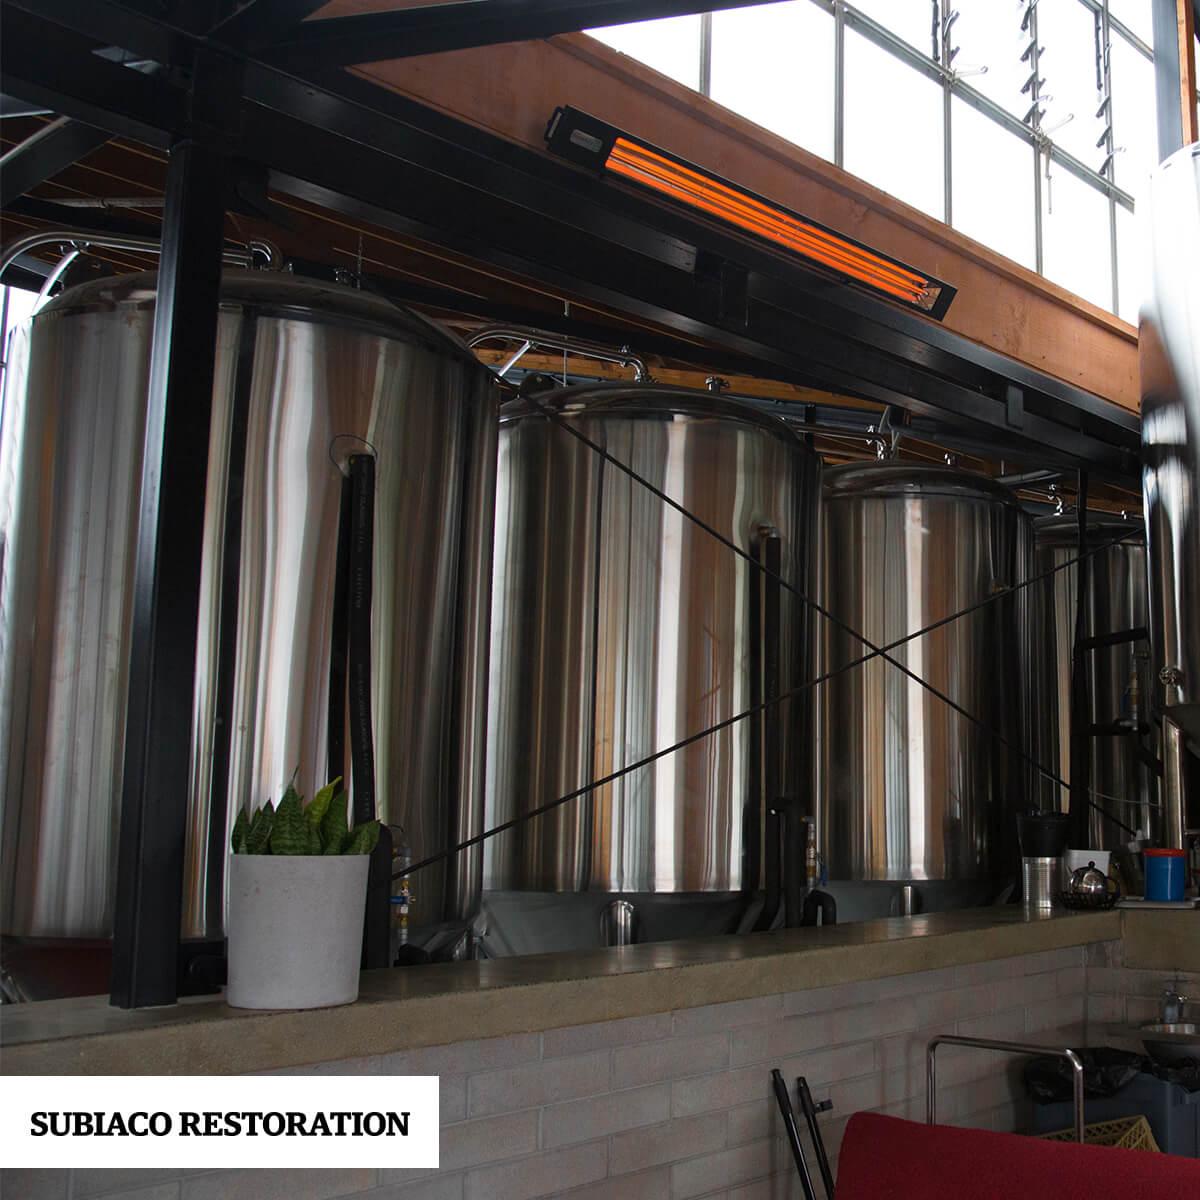 Distributor - Subiaco Restoration